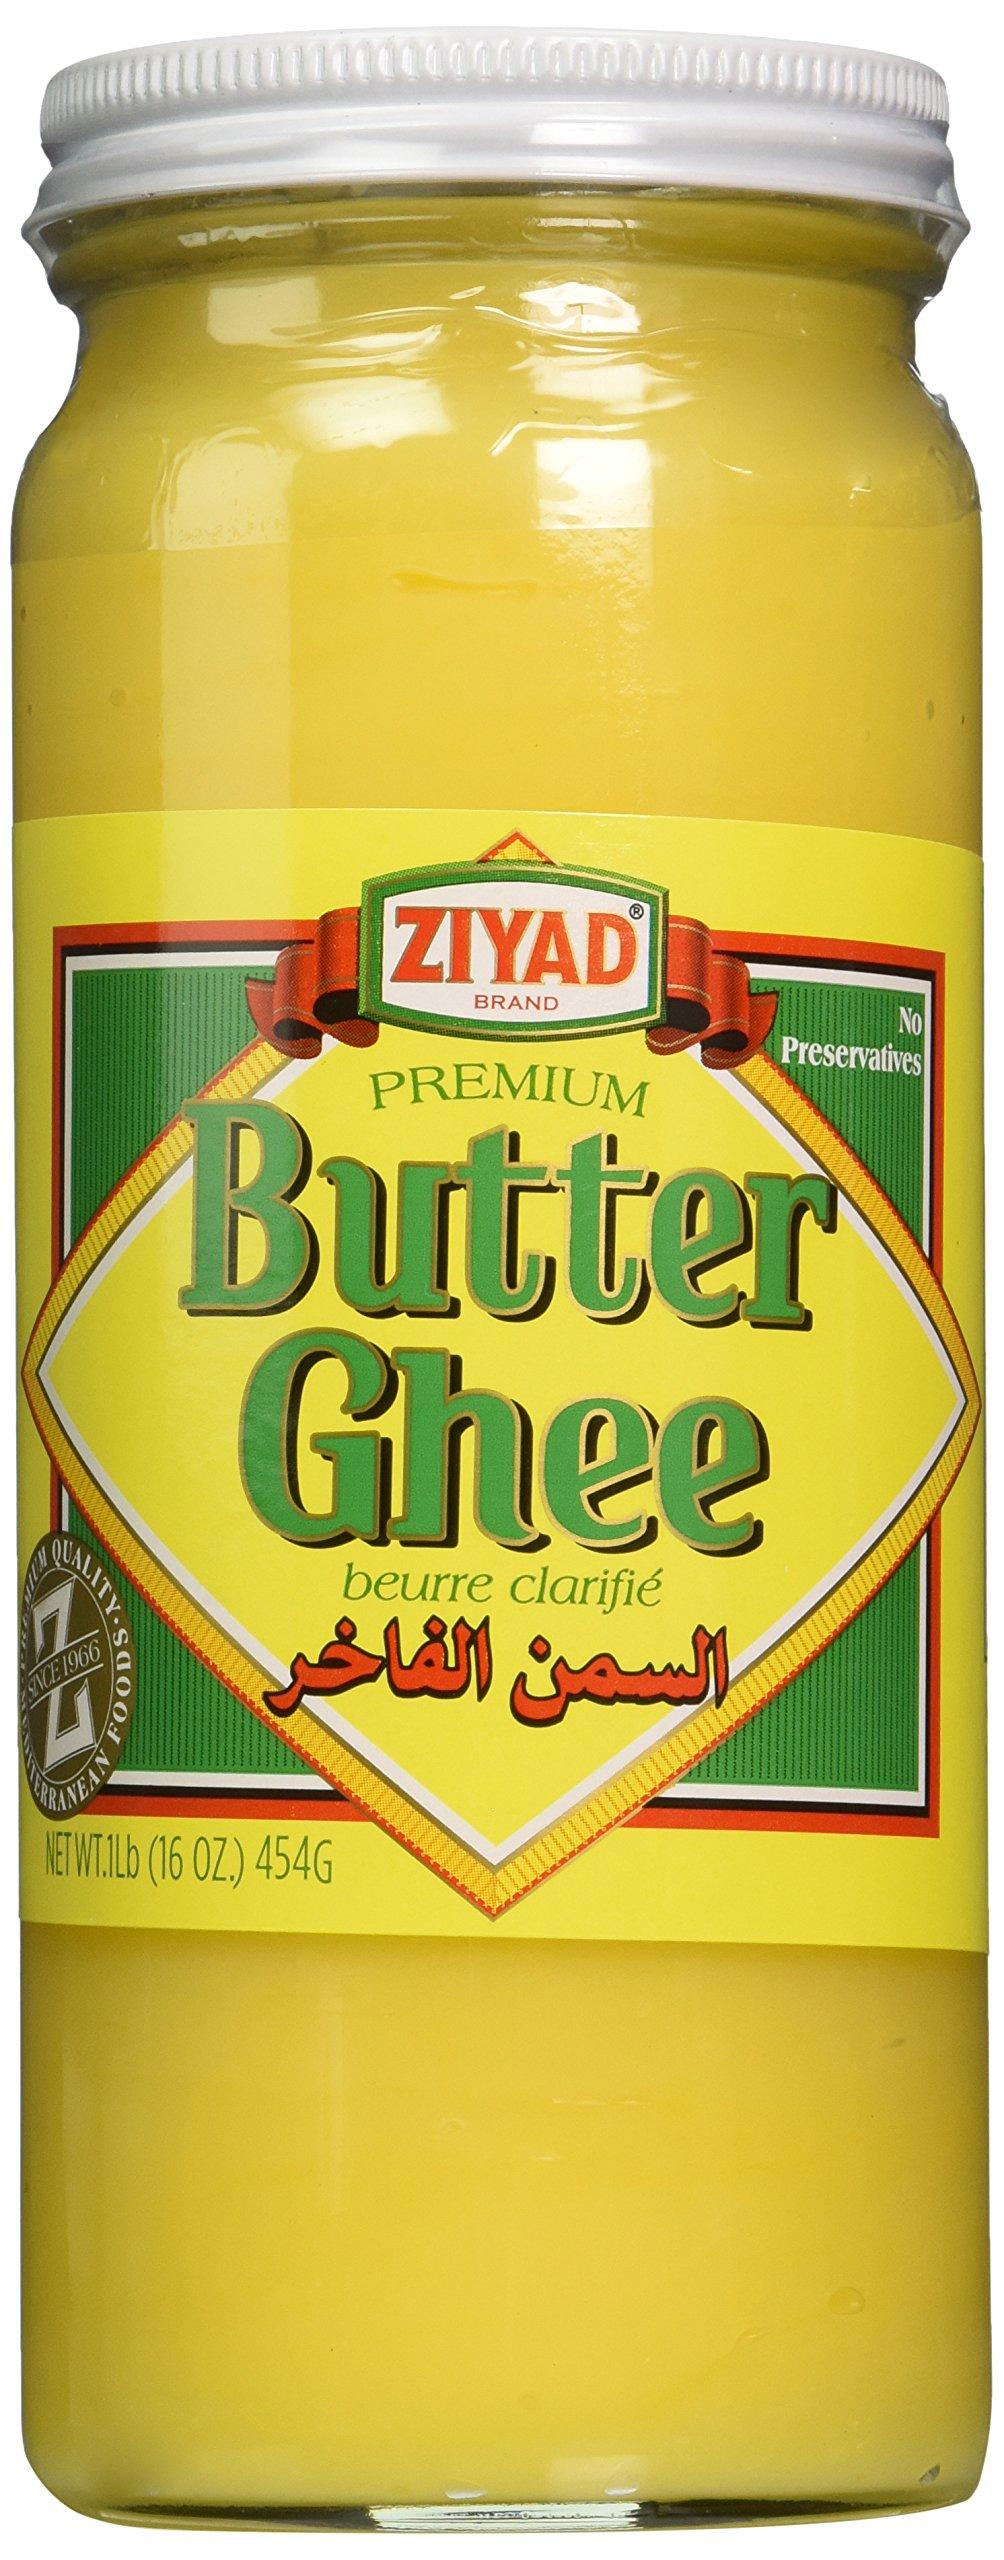 Ziyad Butter Ghee (1 Lb) by Ziyad